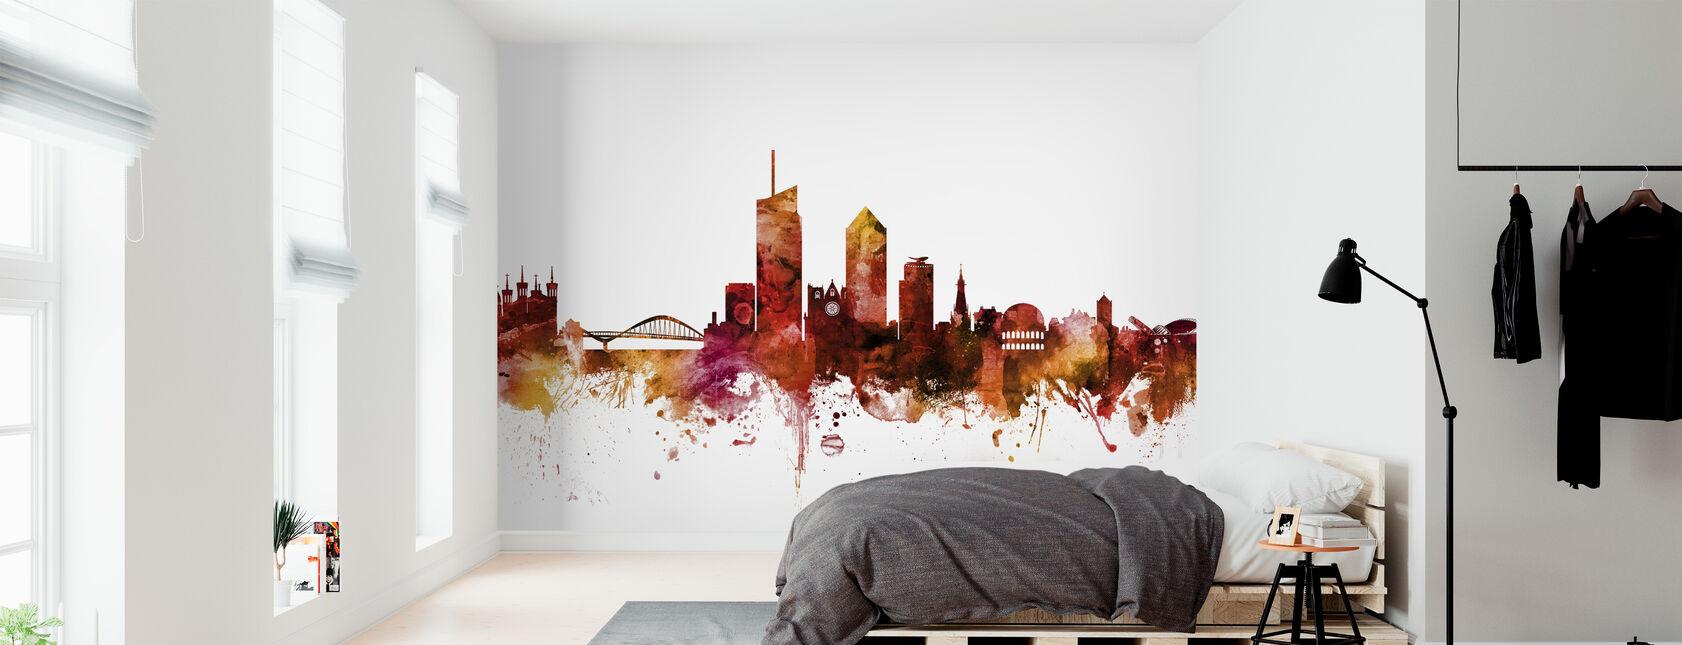 Lyon France Skyline - Wallpaper - Bedroom